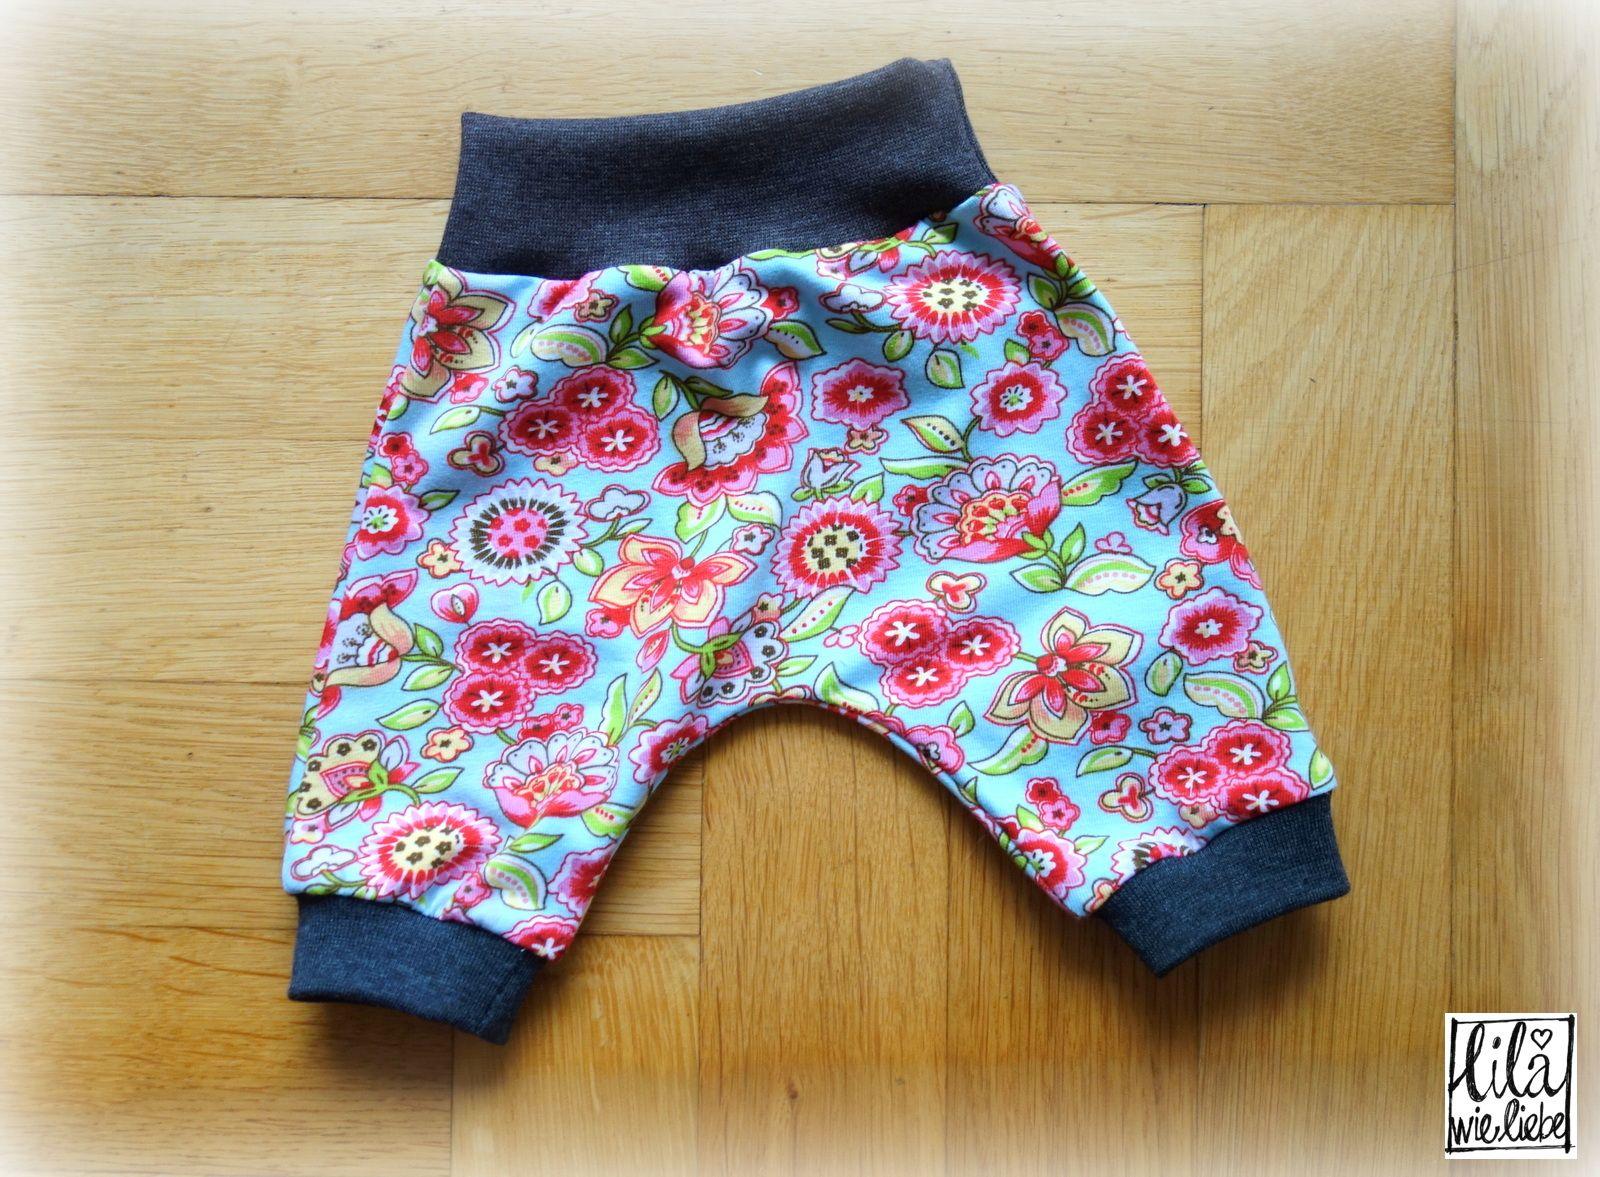 neugeborenen fr hchen und puppenhose broekje mini selbst n hen patterns pinterest. Black Bedroom Furniture Sets. Home Design Ideas